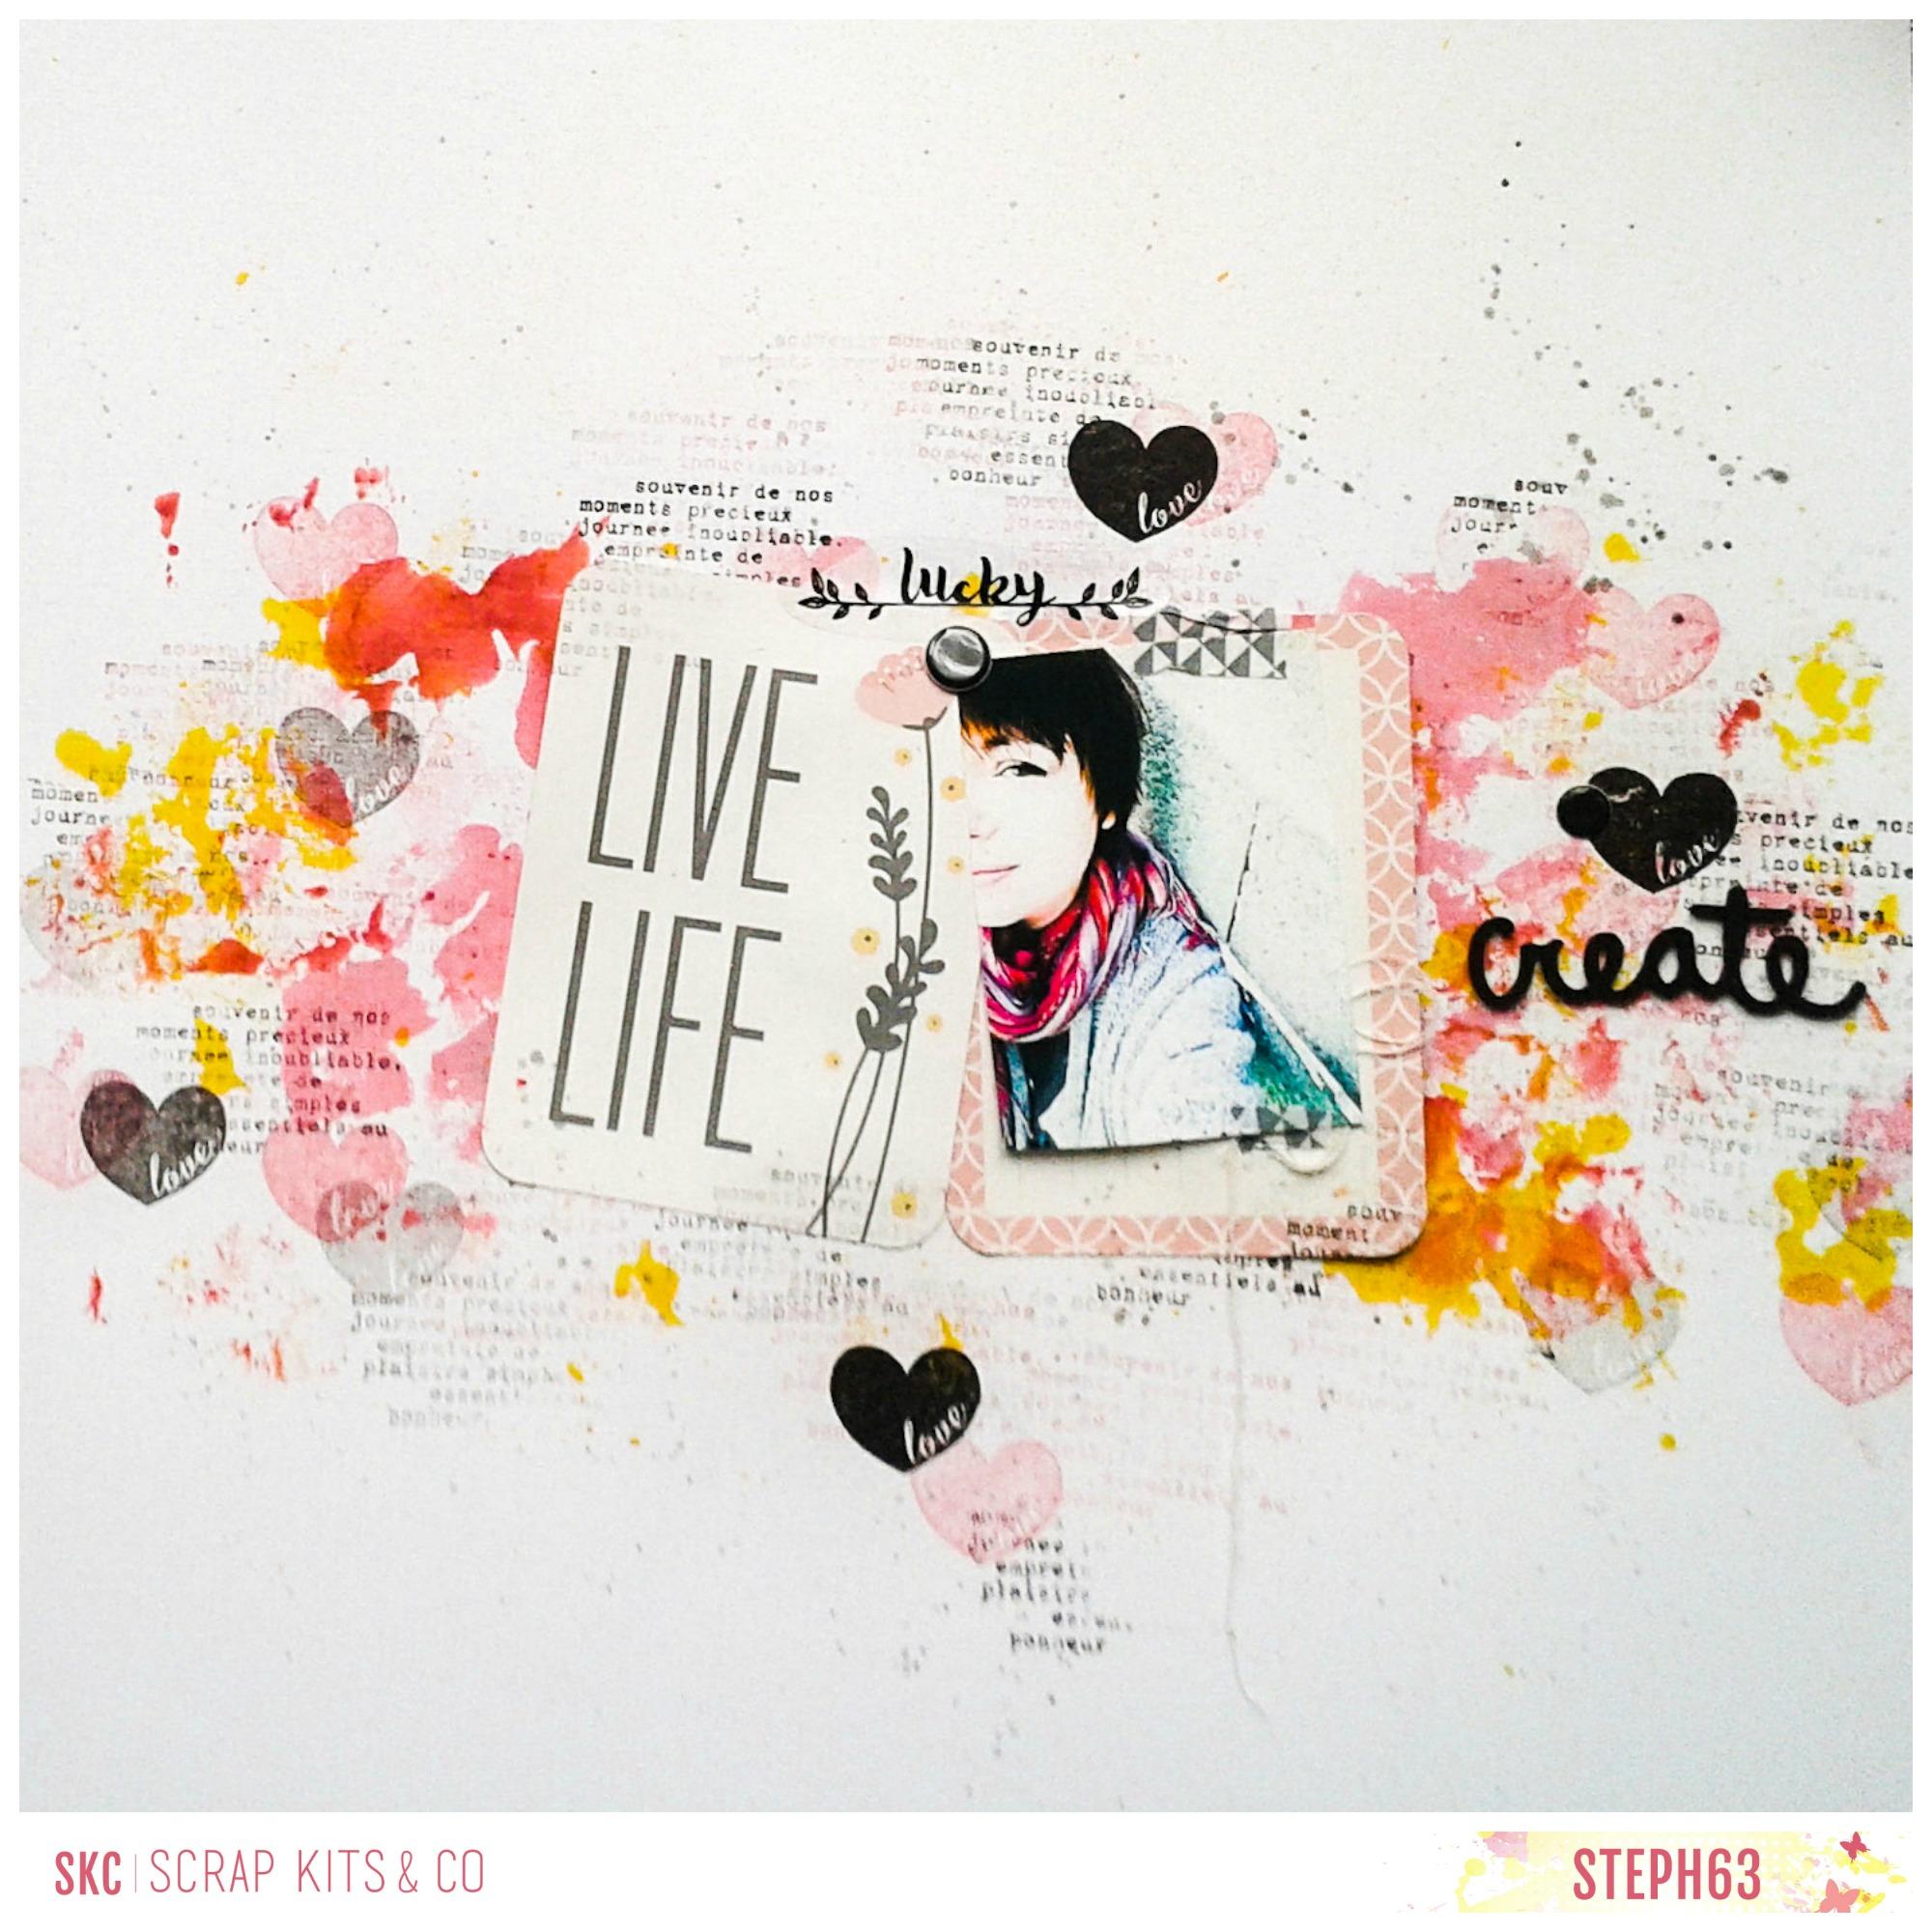 live, life, create